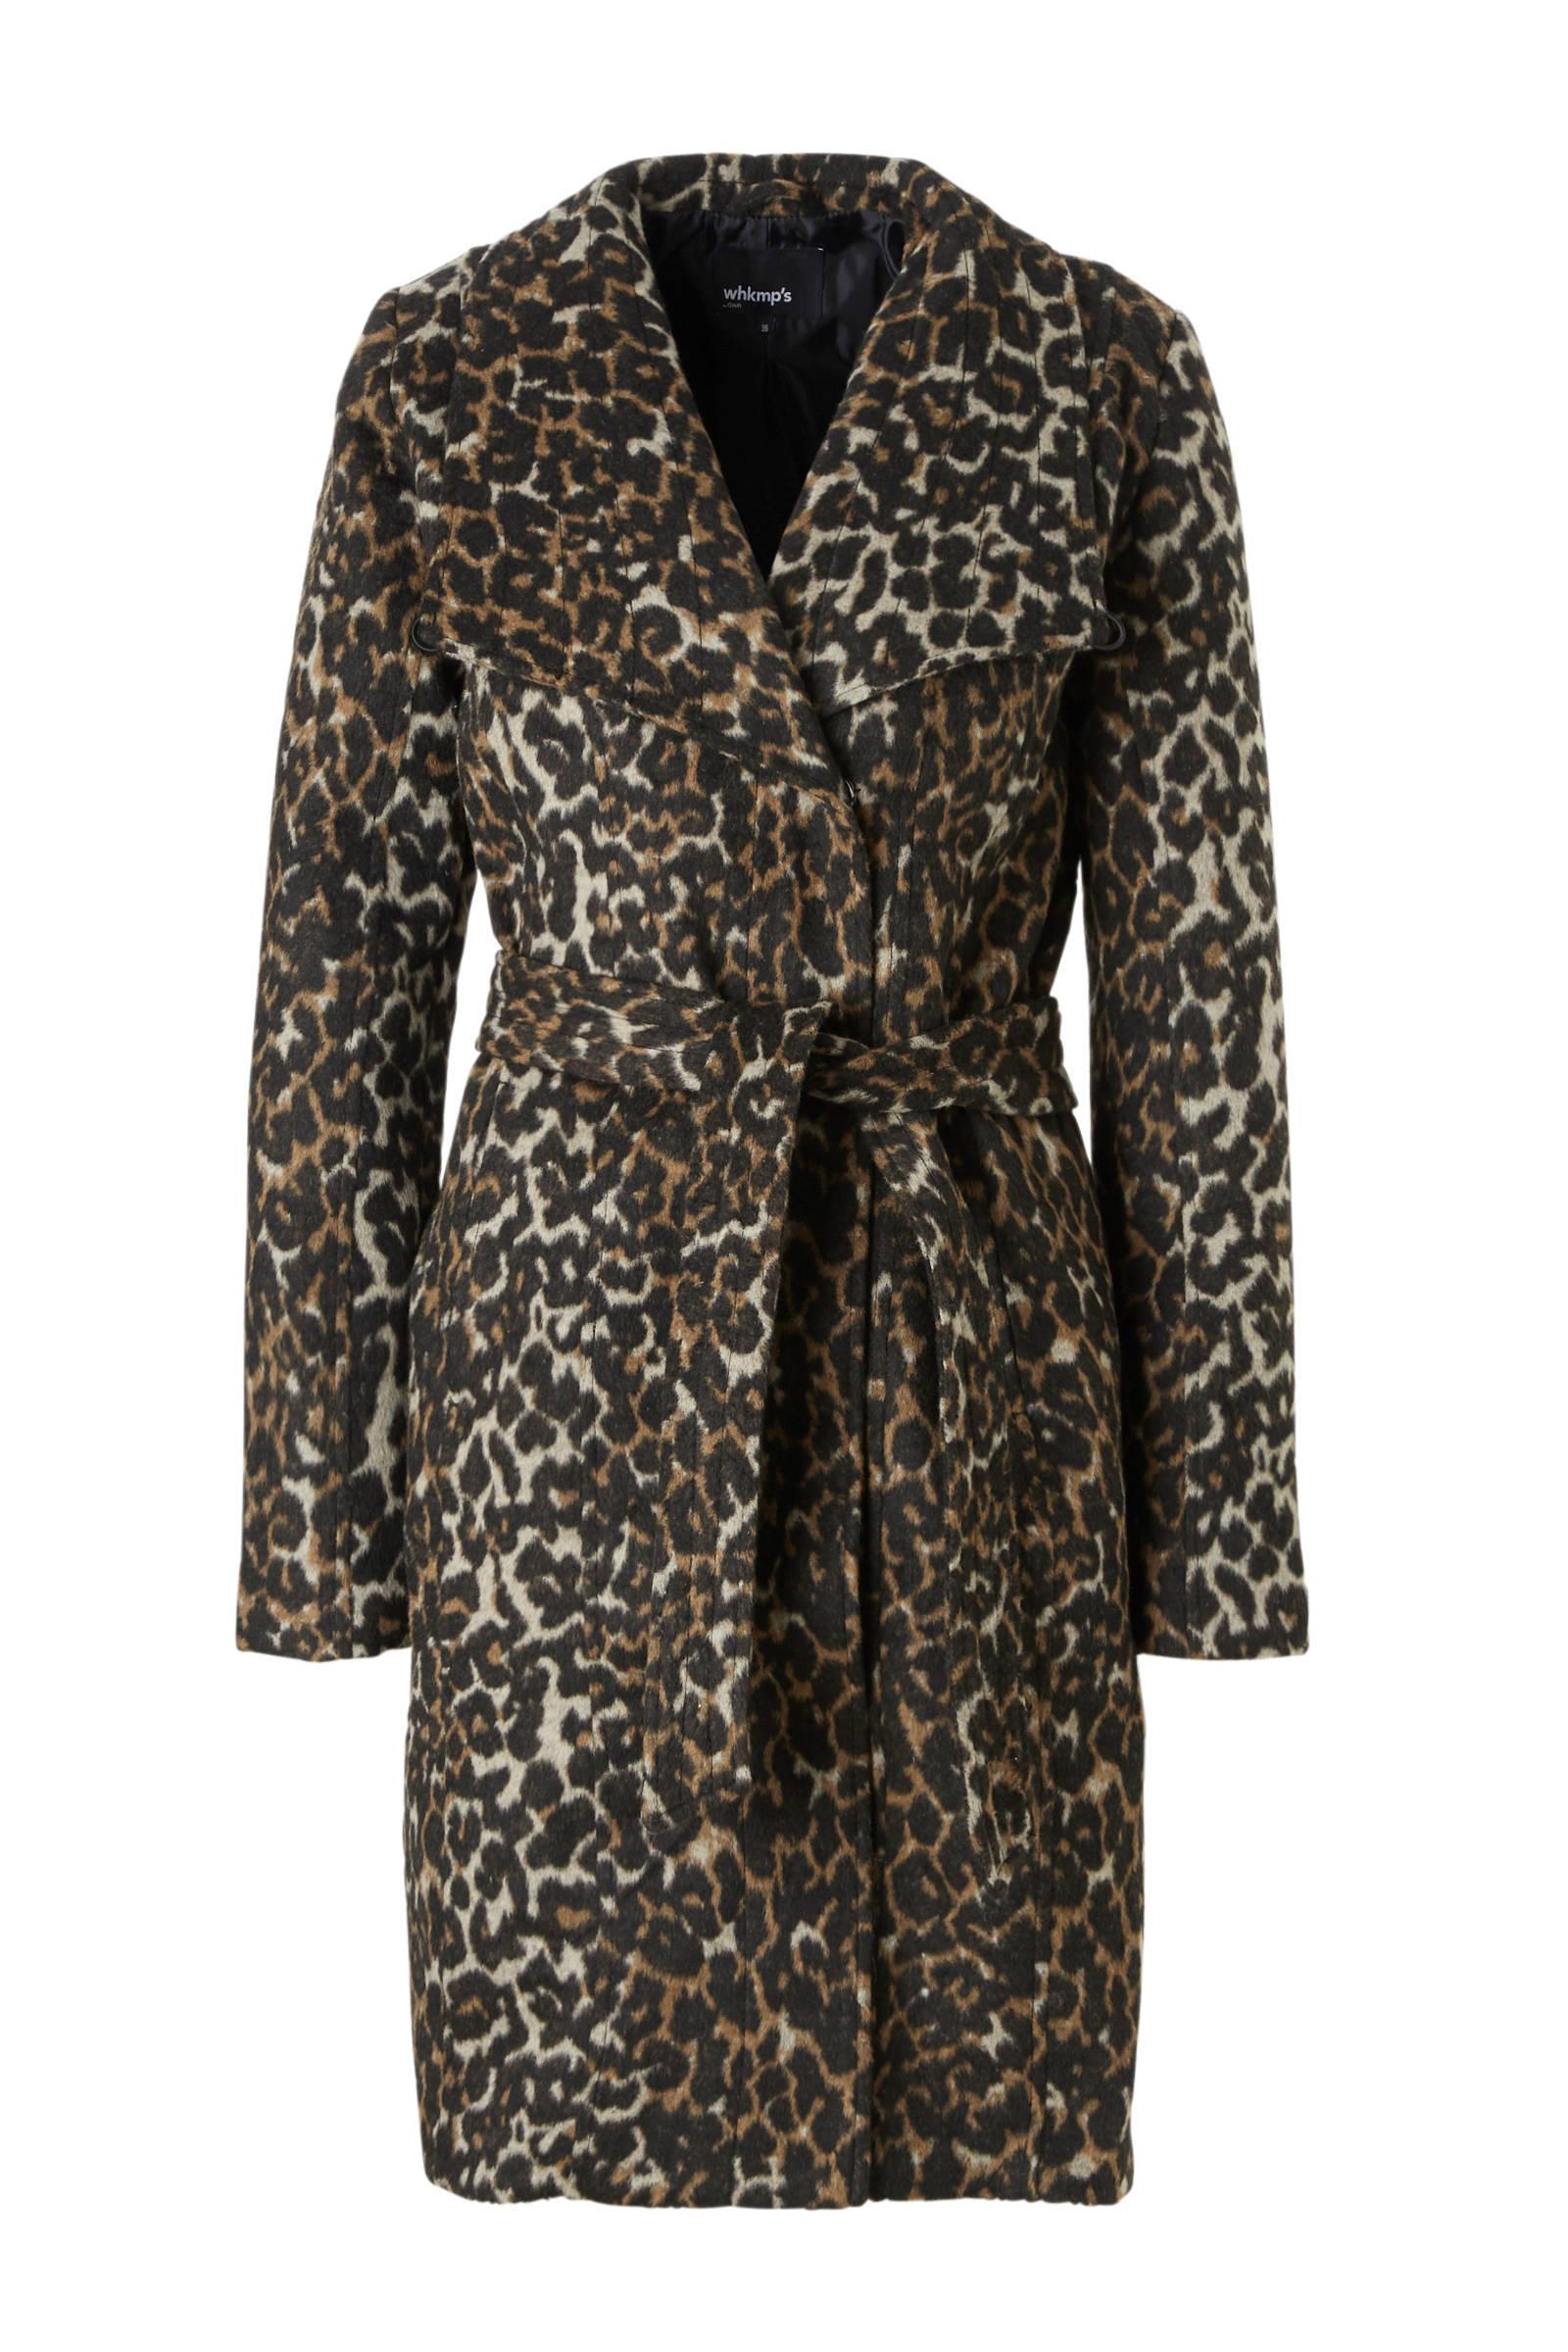 product afbeelding whkmp's own coat met panterprint (dames)